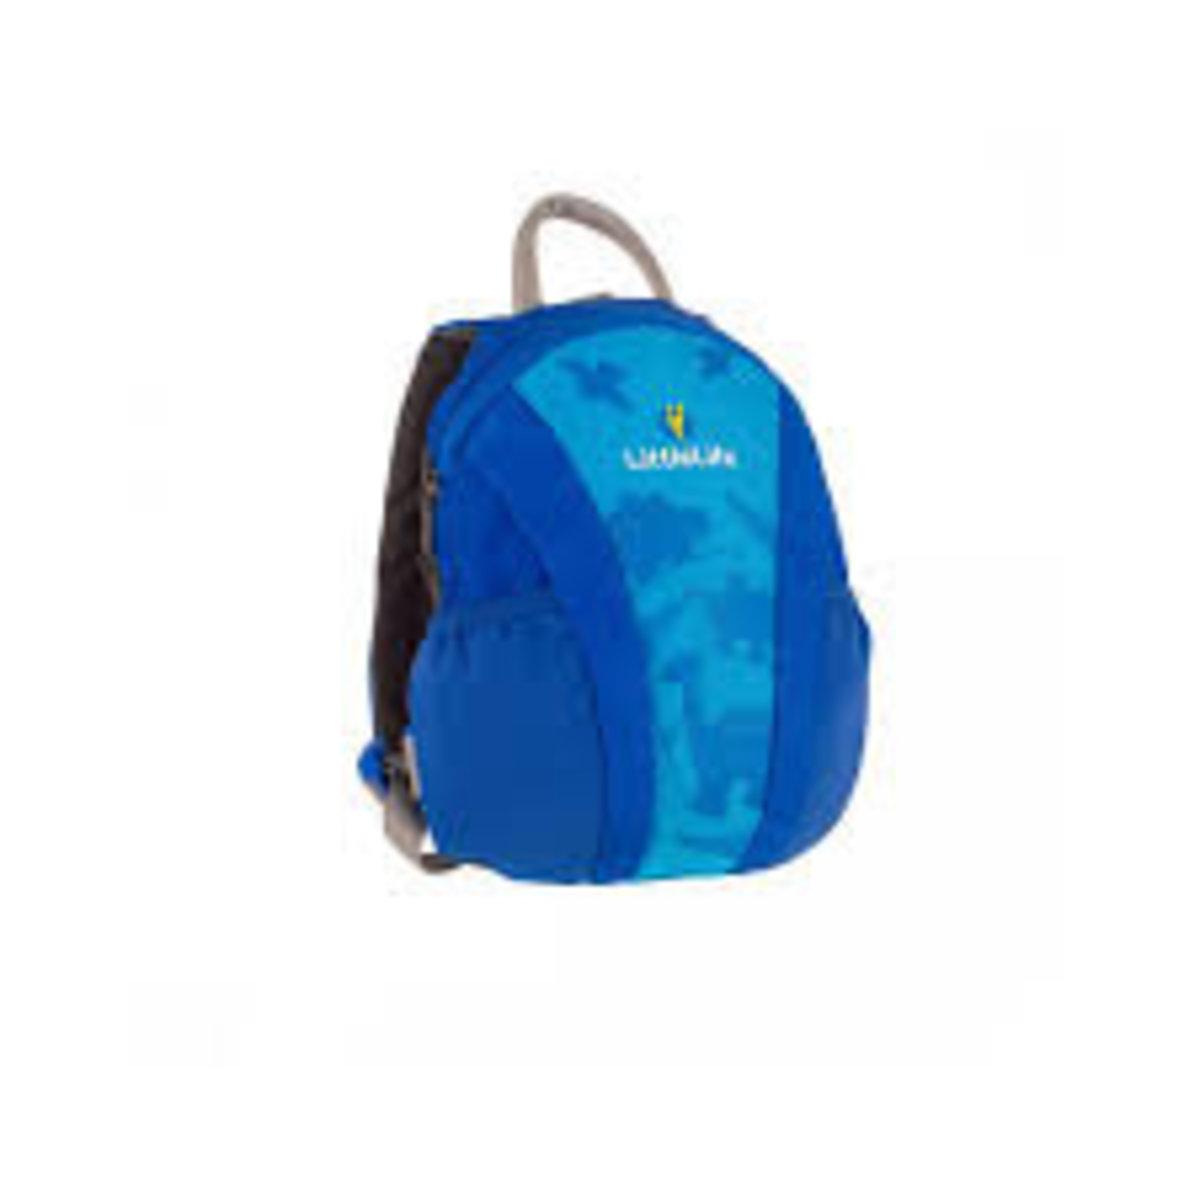 LML Toddler D'sack Runabout Blue